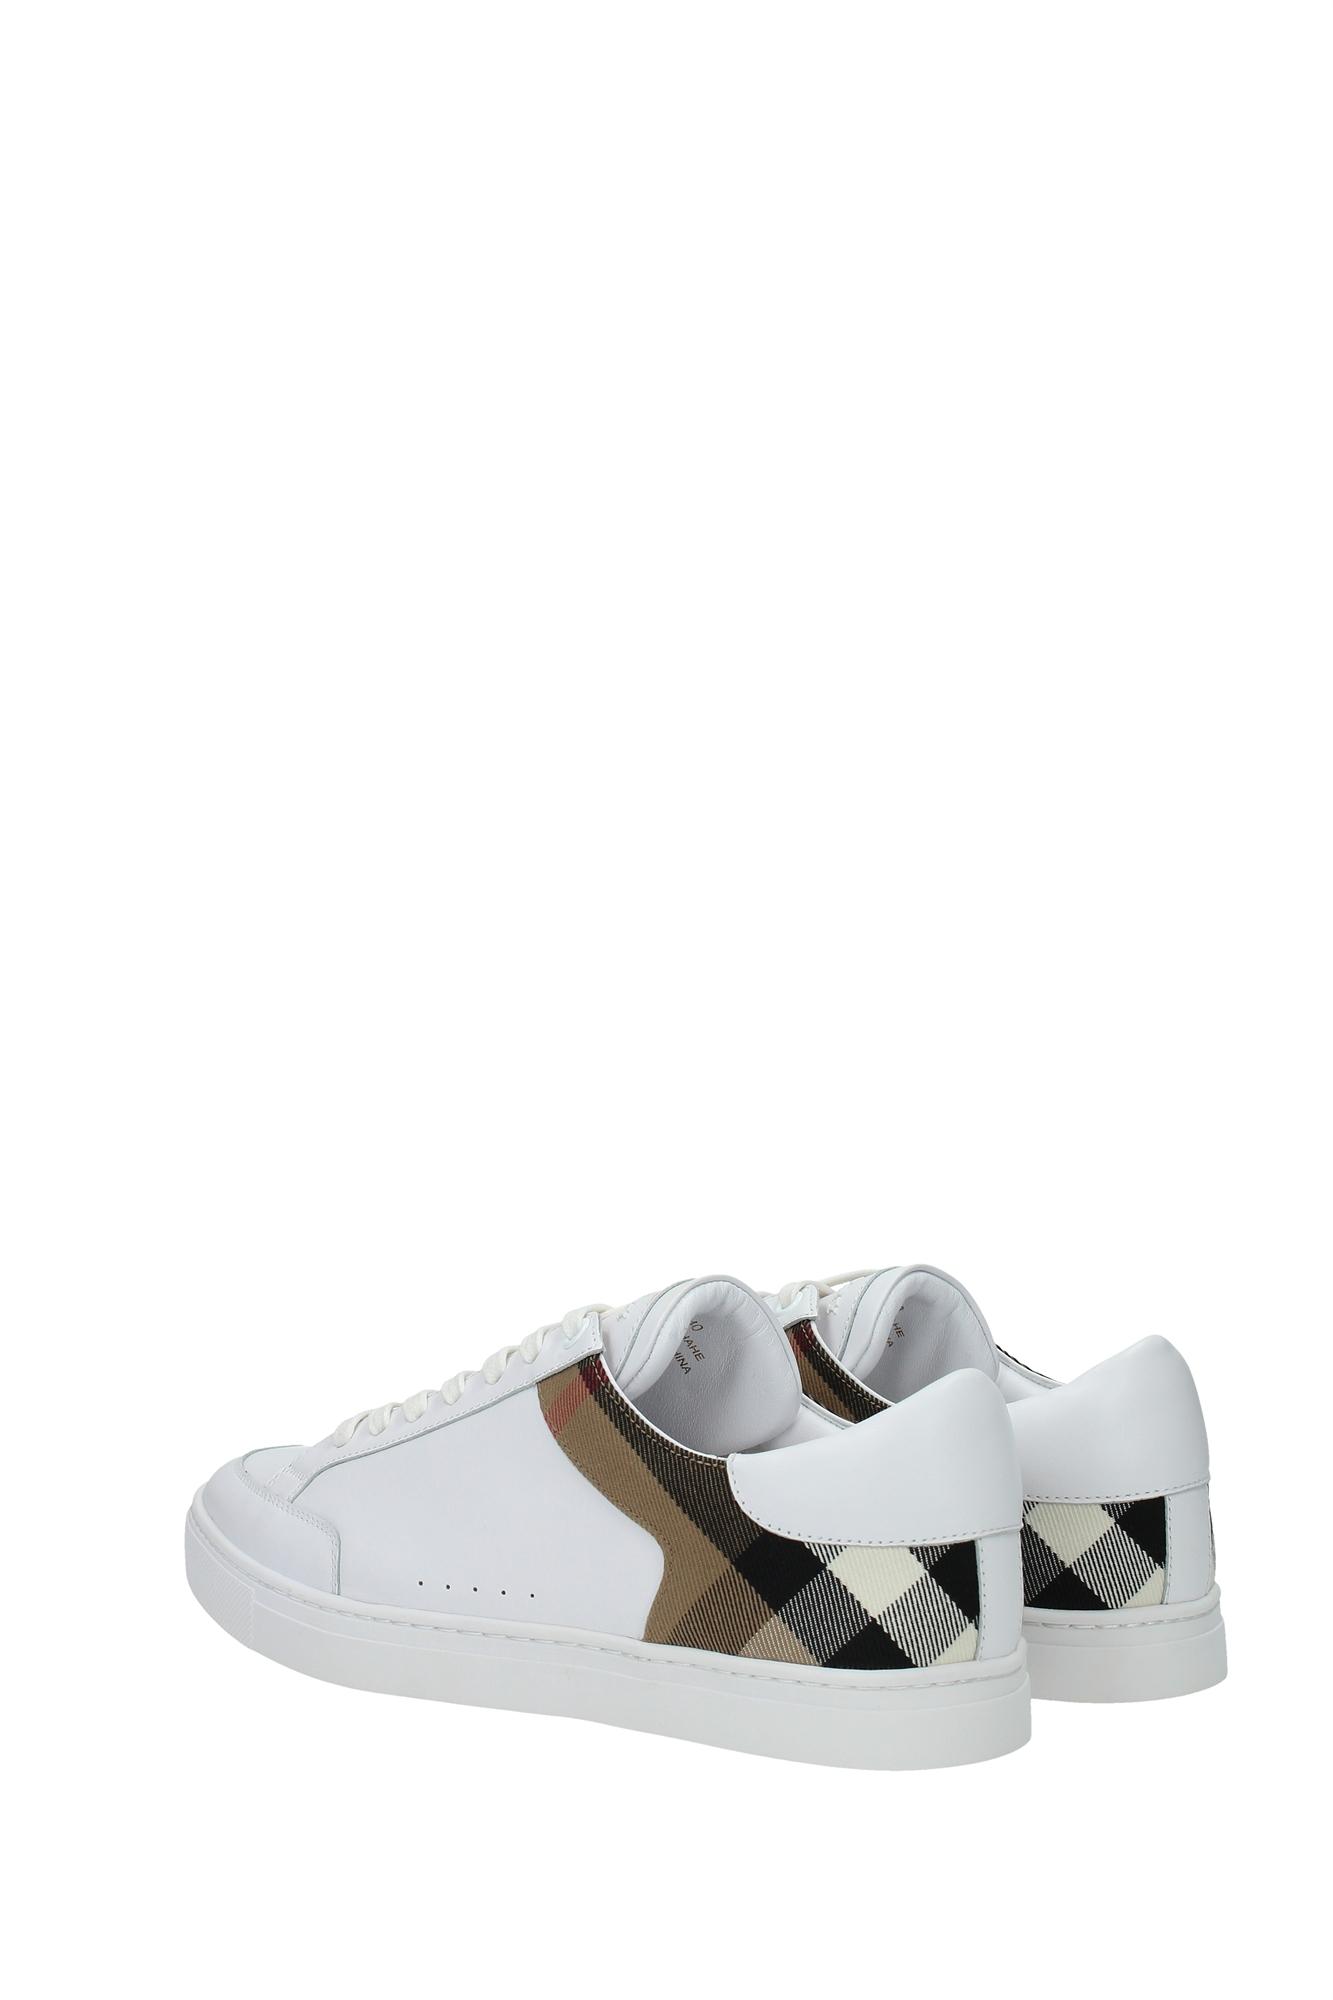 Burberry Sneakers Uomo